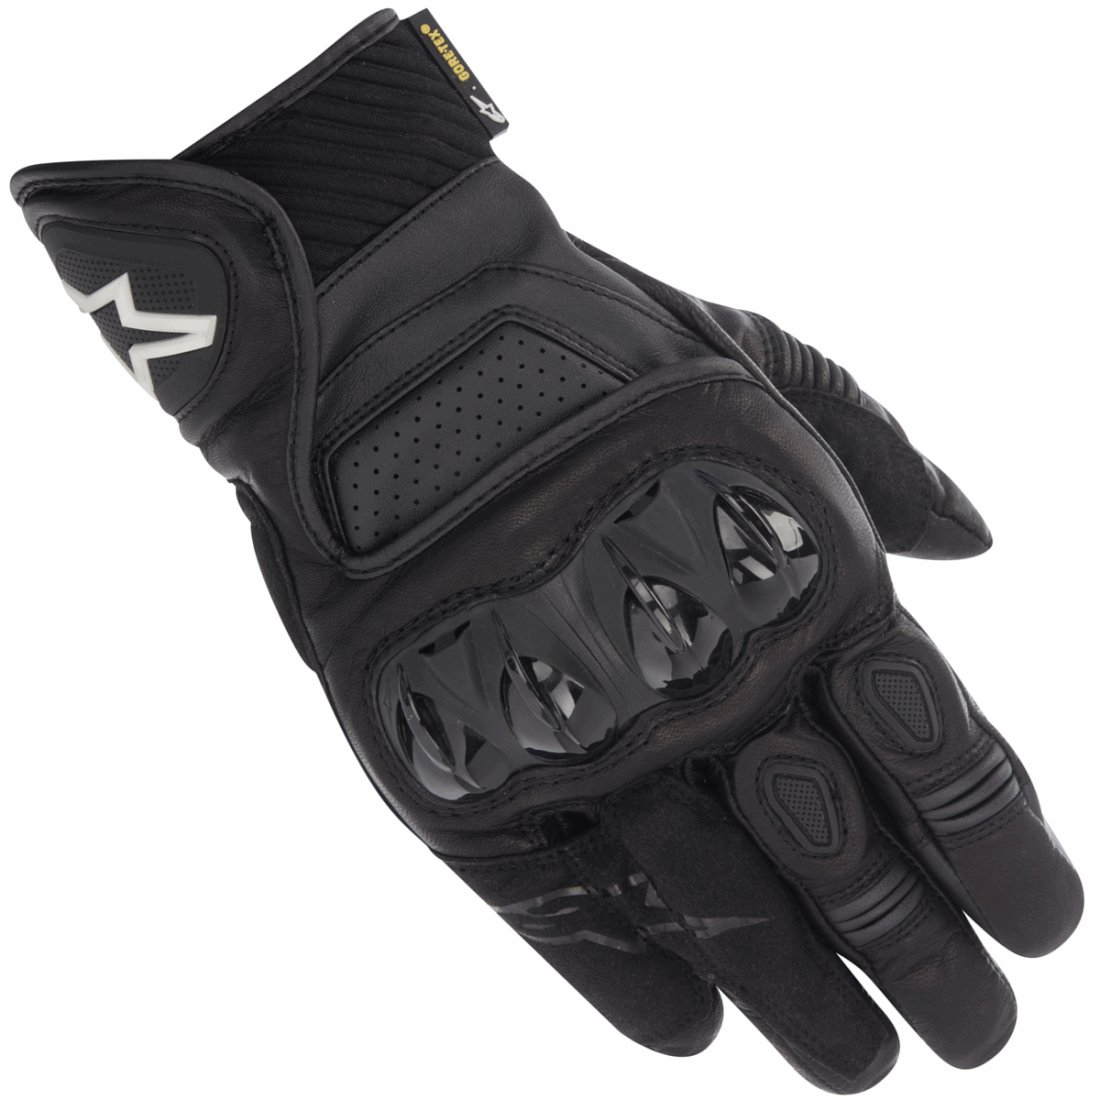 Xtrafit motorcycle gloves - Alpinestars Celer Gore Tex X Trafit Black